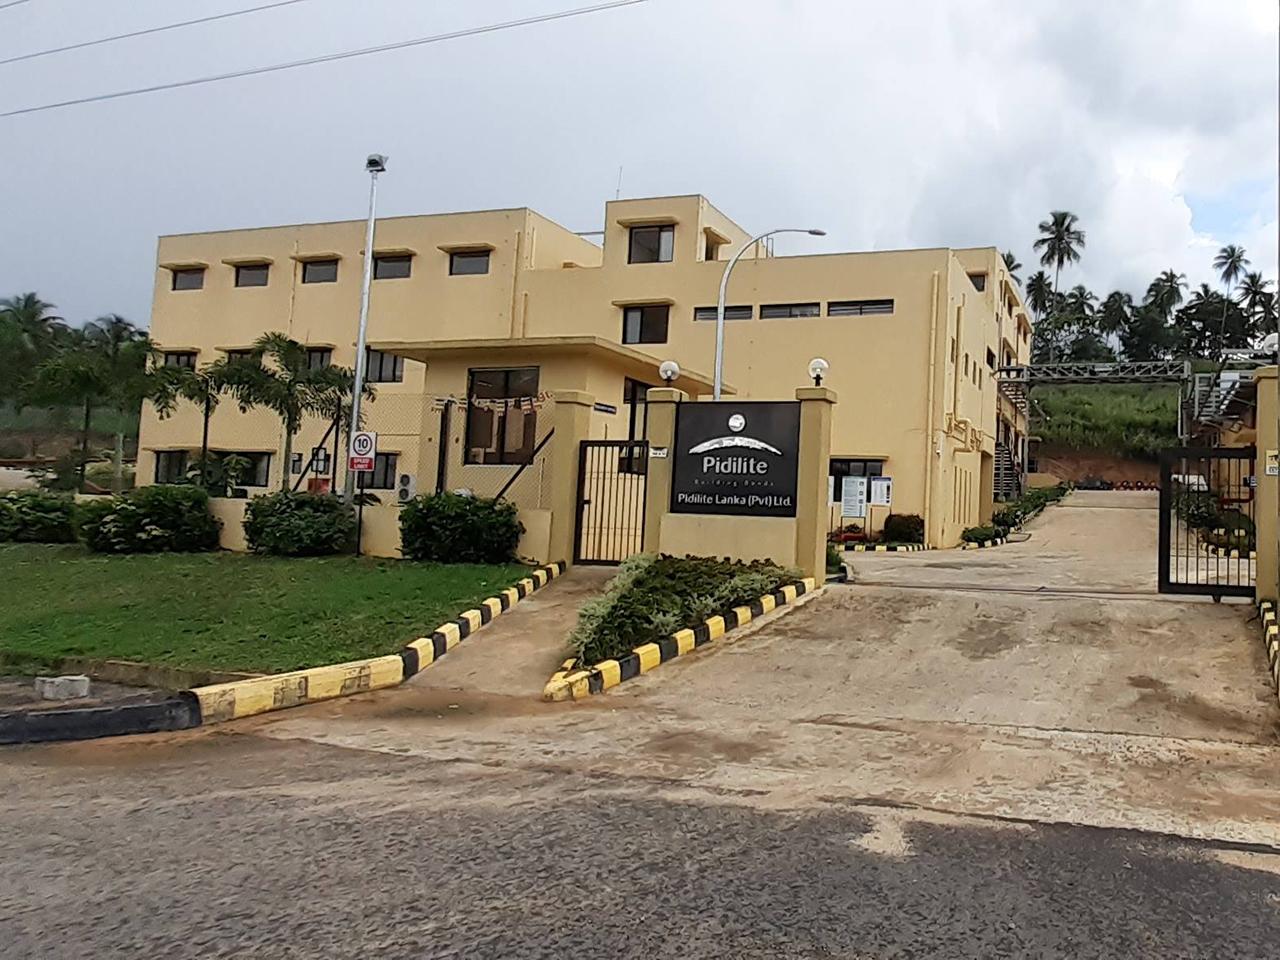 Pidilite Lanka Factory, Polgahawela